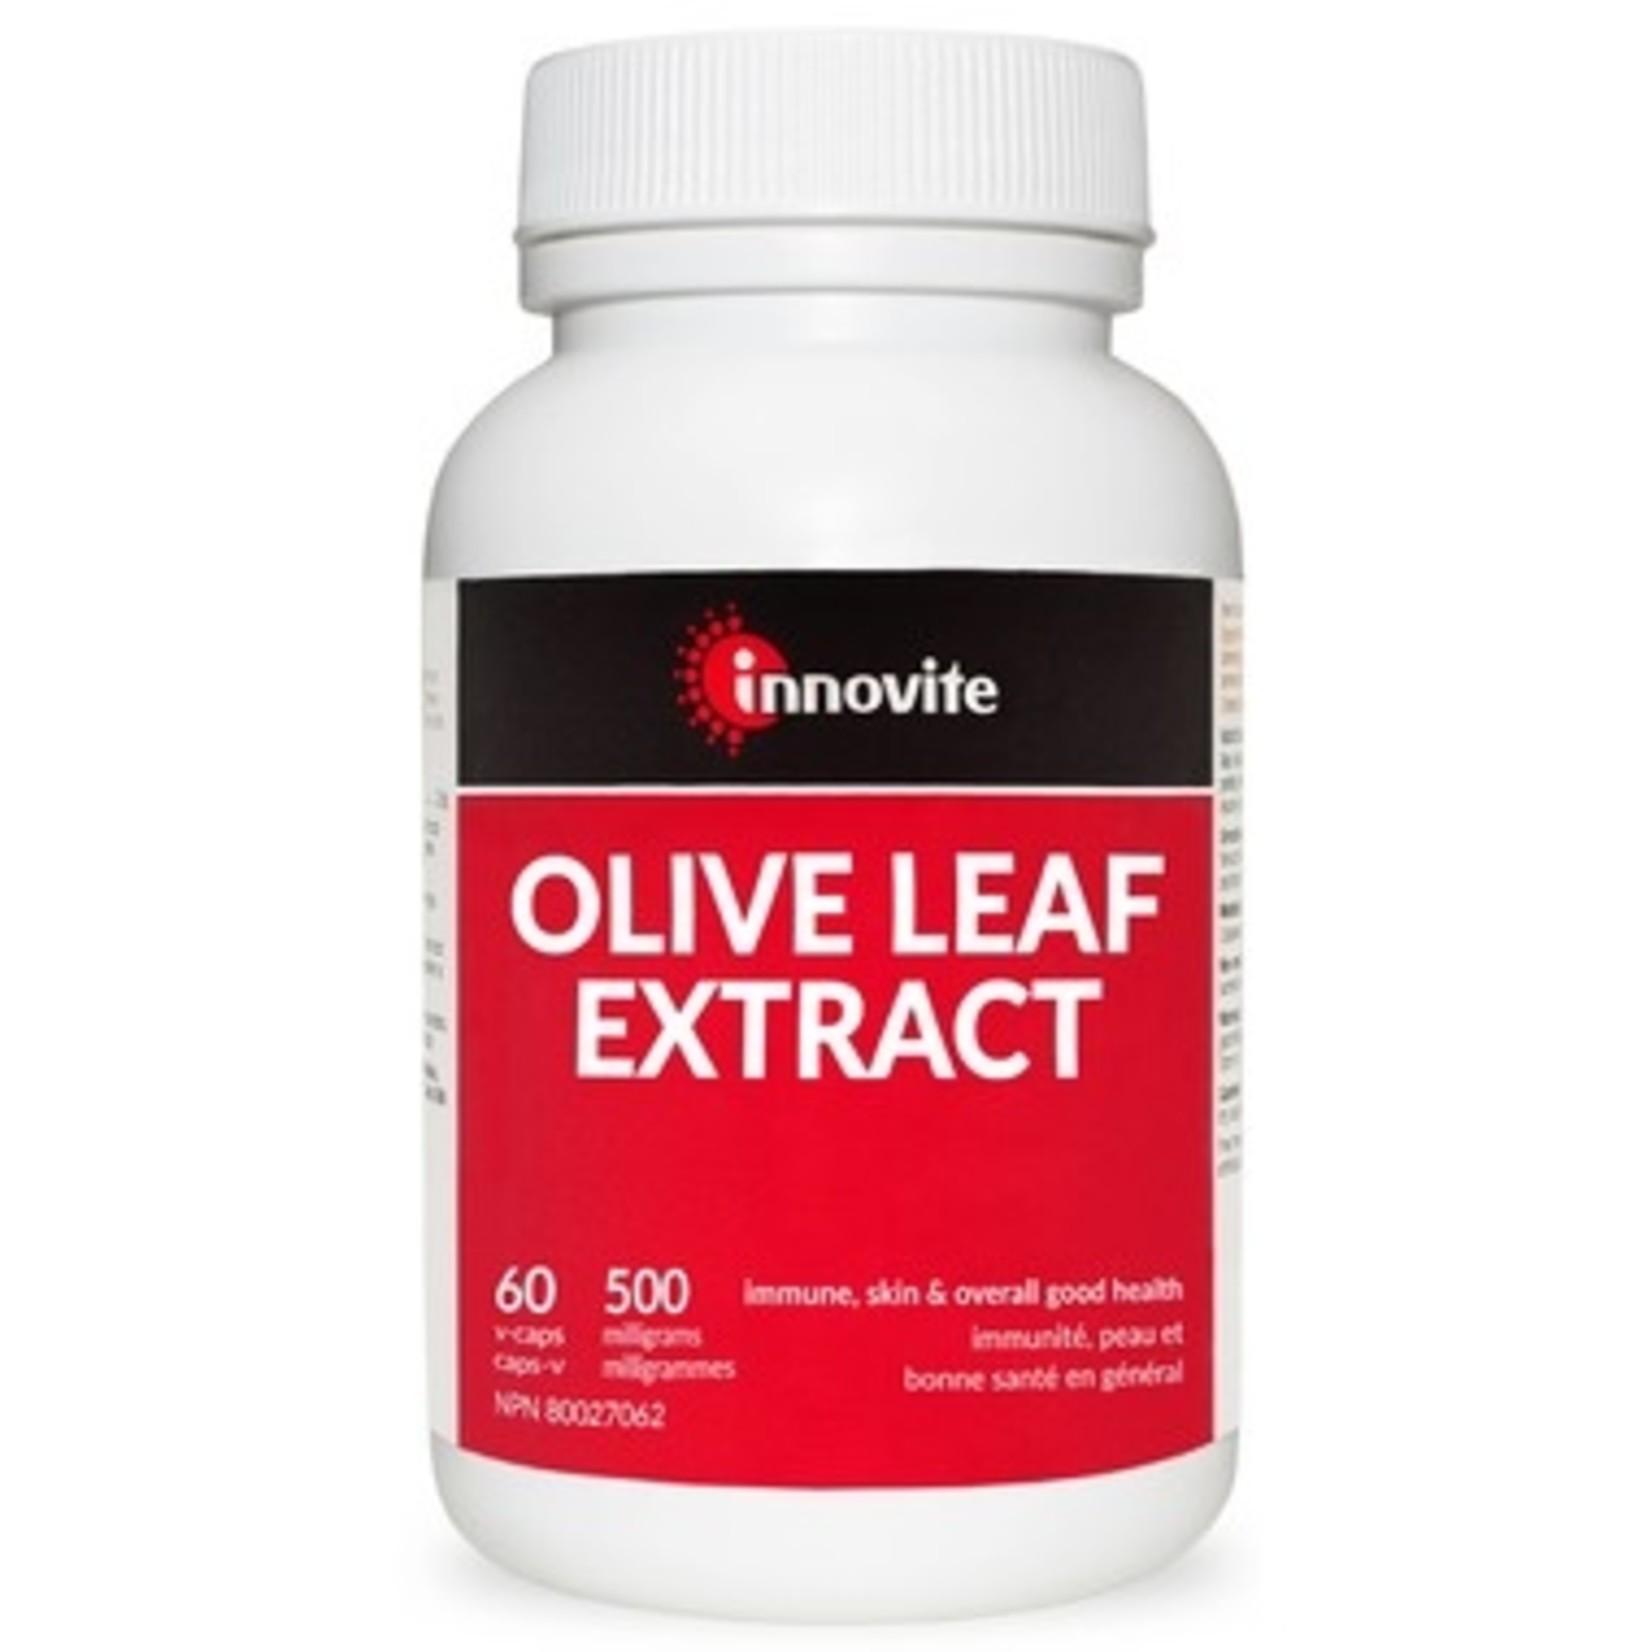 Innovite Olive Leaf Extract 500mg 60caps